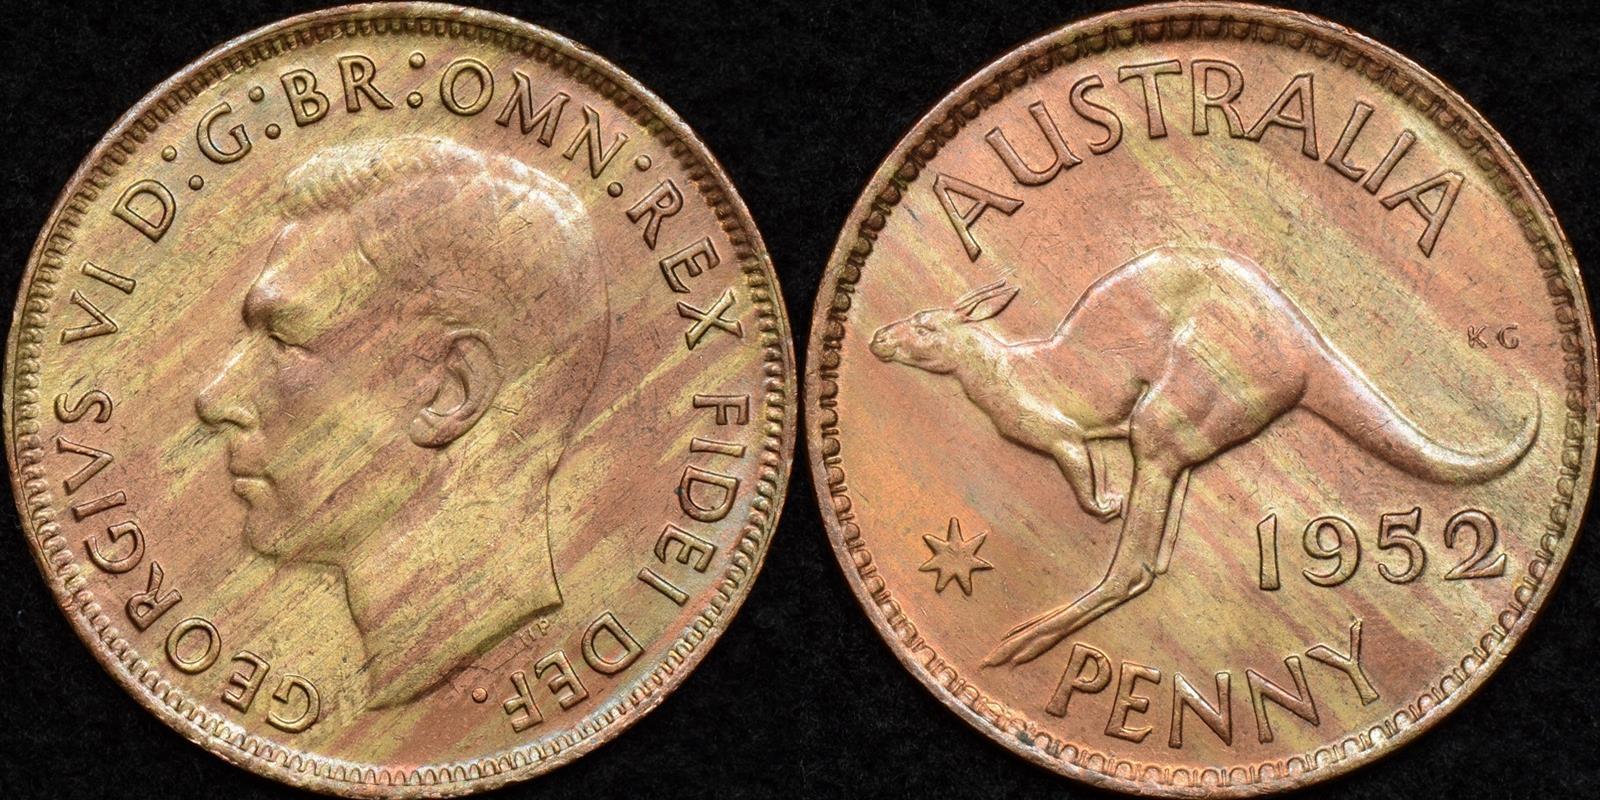 Australia 1952m penny Uncirculated